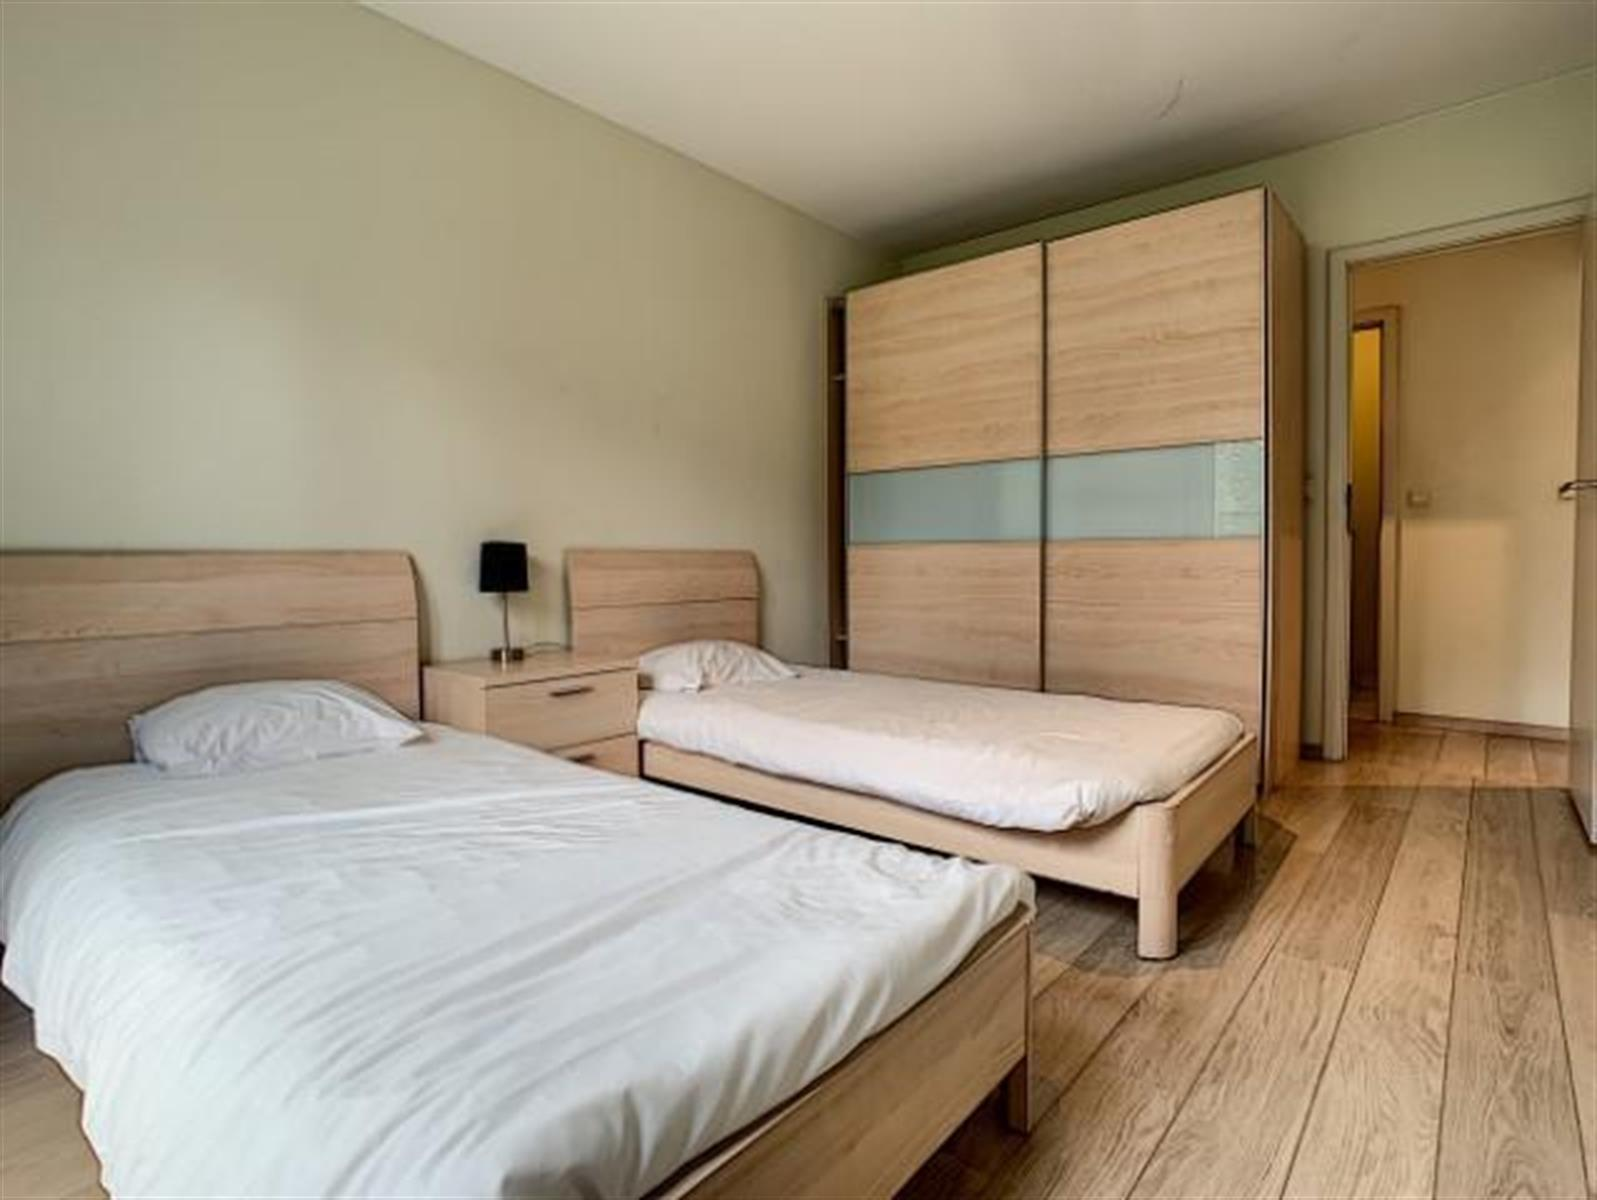 Appartement - Woluwe-Saint-Lambert - #4147227-7